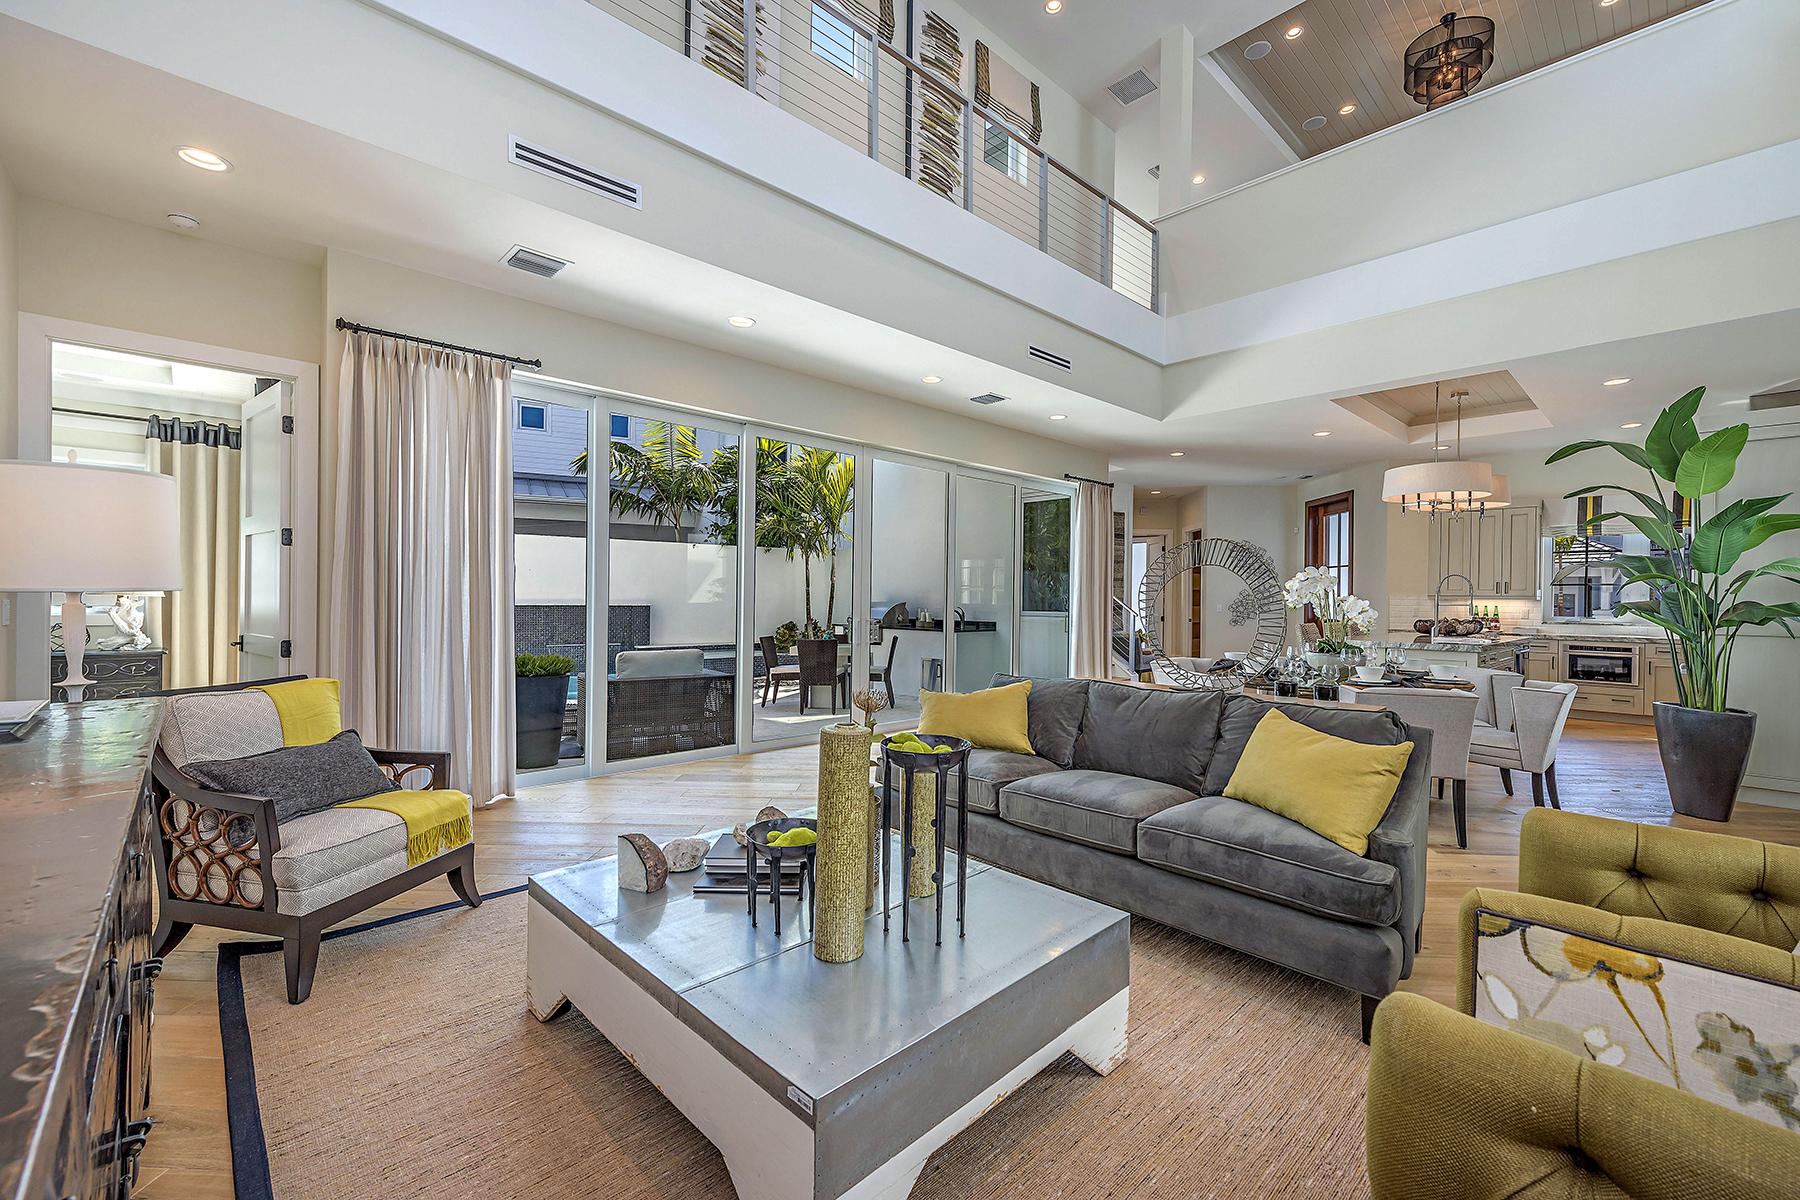 Single Family Home for Sale at RESIDENCES AT MERCATO 9165 Mercato Way, Naples, Florida 34108 United States